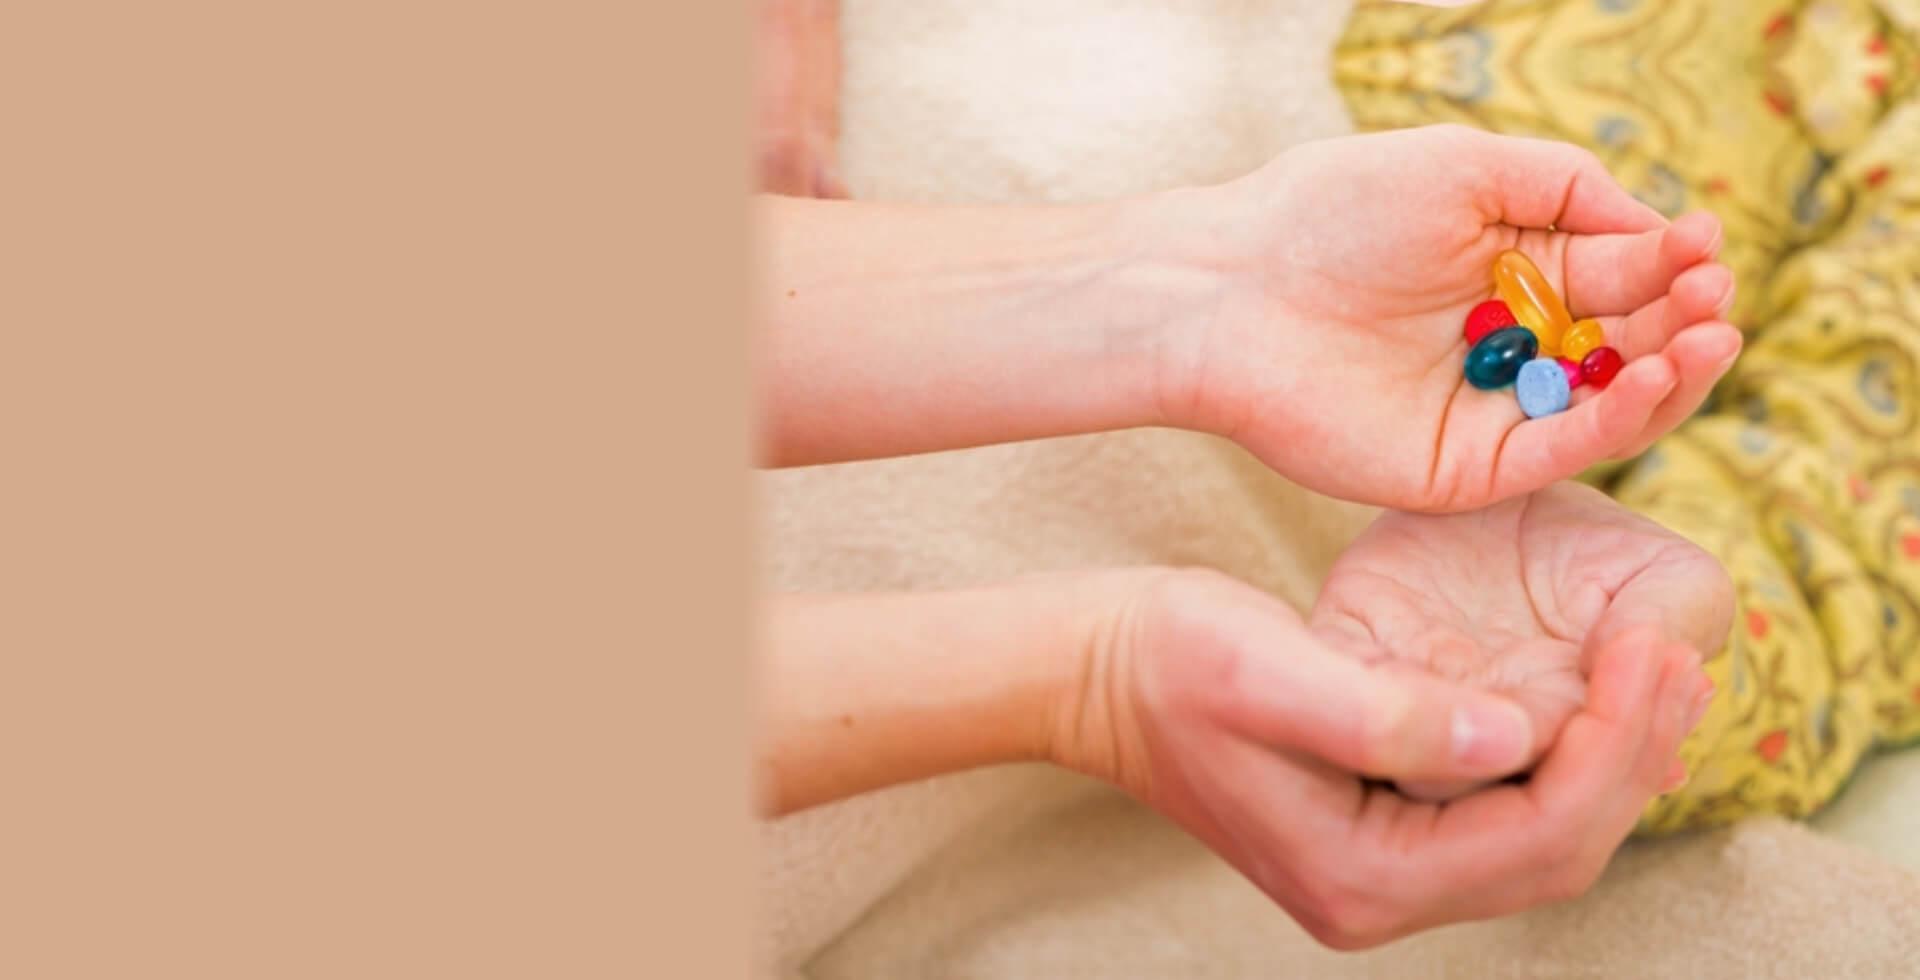 Medicines on hands